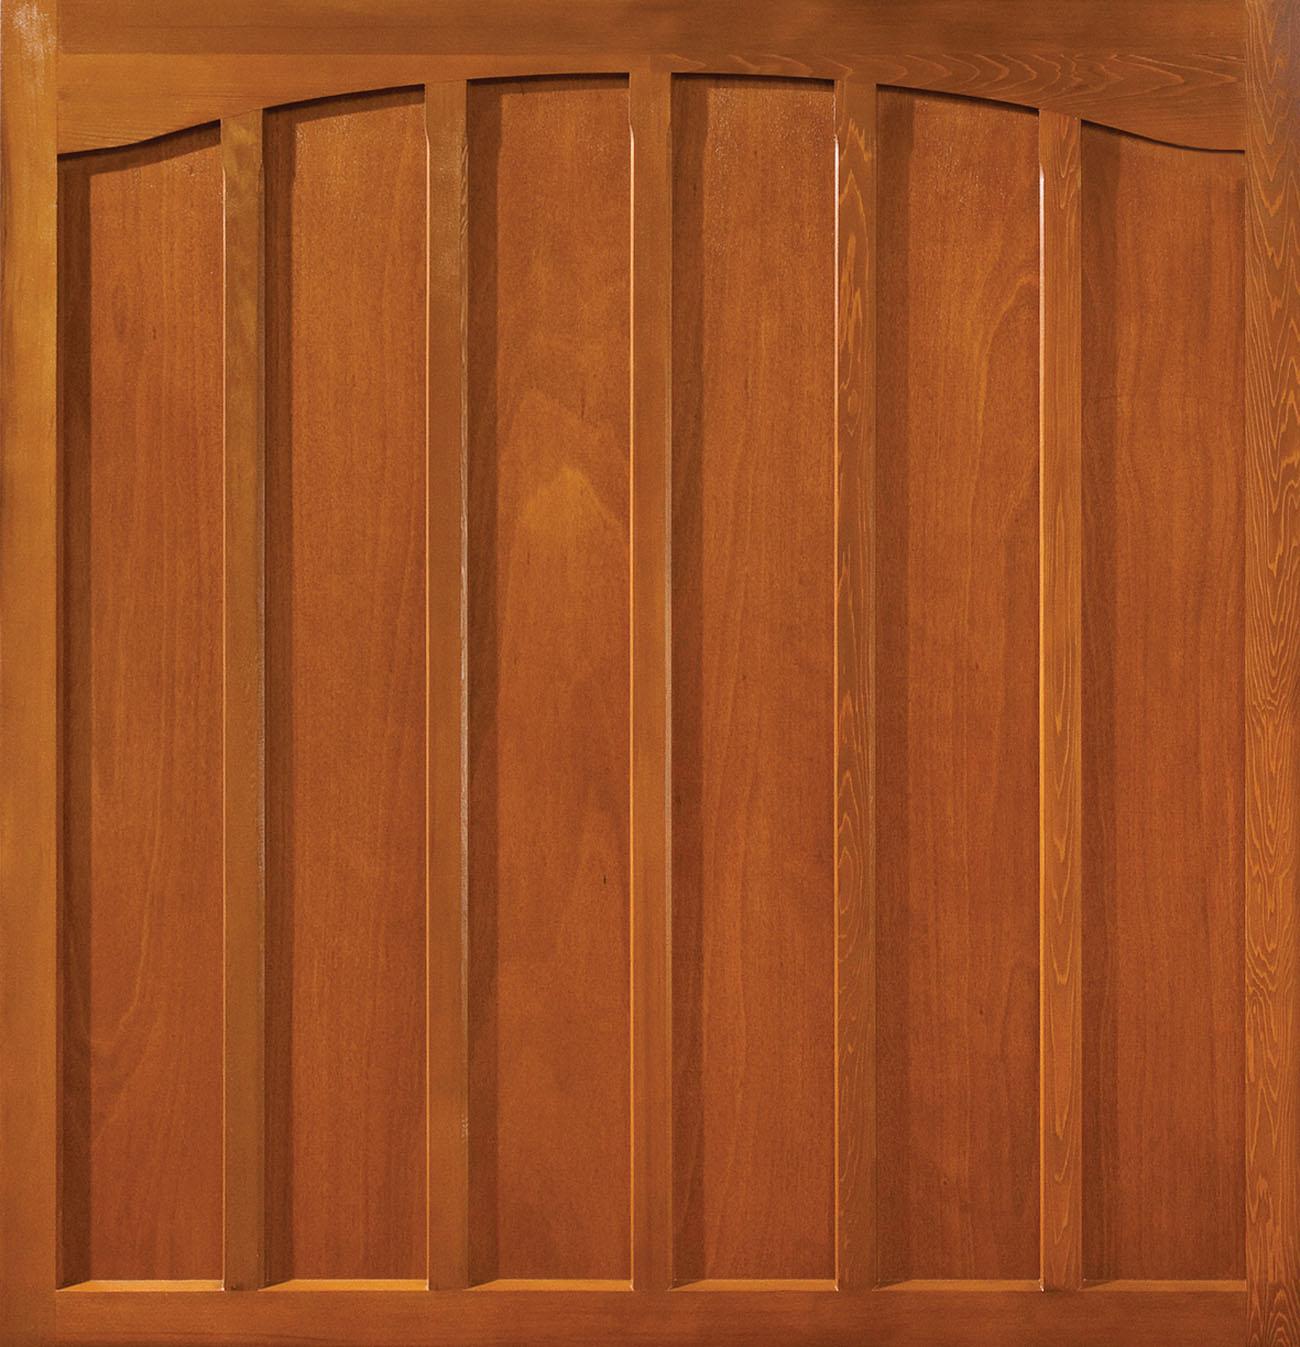 Washford panel-built cedar